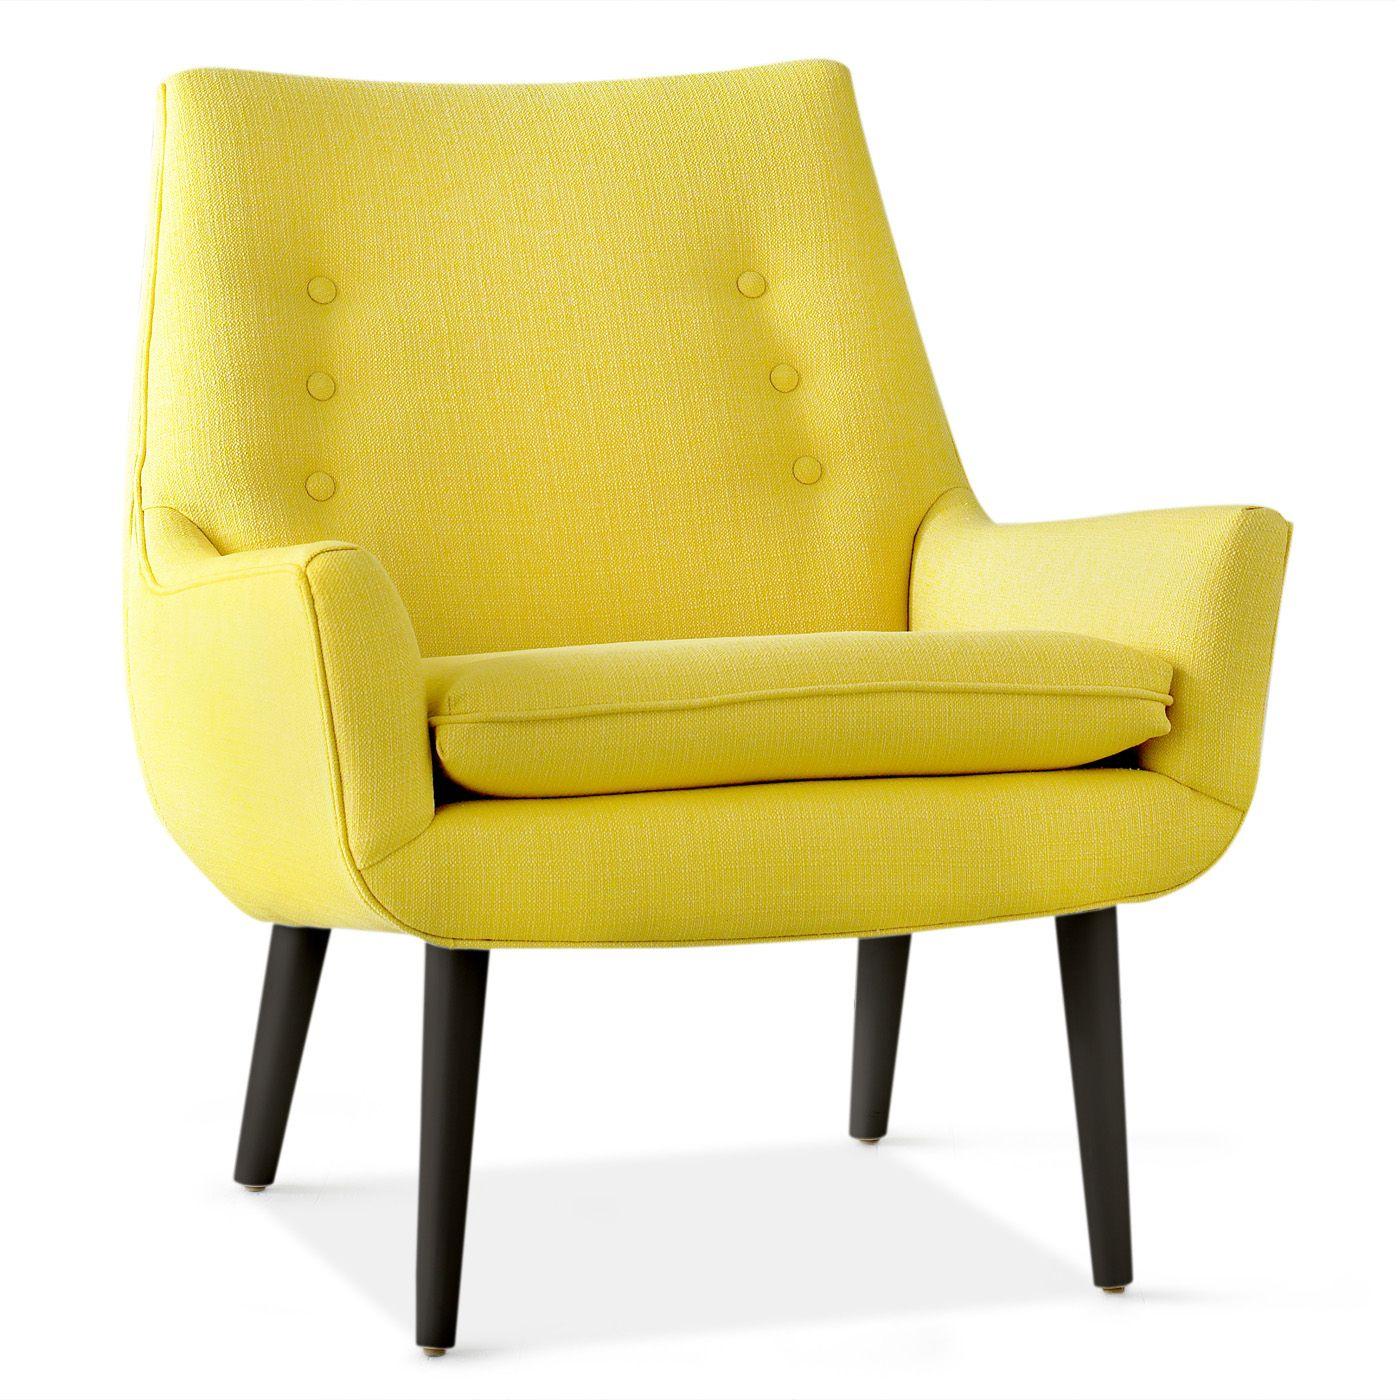 Mrs Godfrey Chair Modern Armchair Design Yellow Chair Yellow